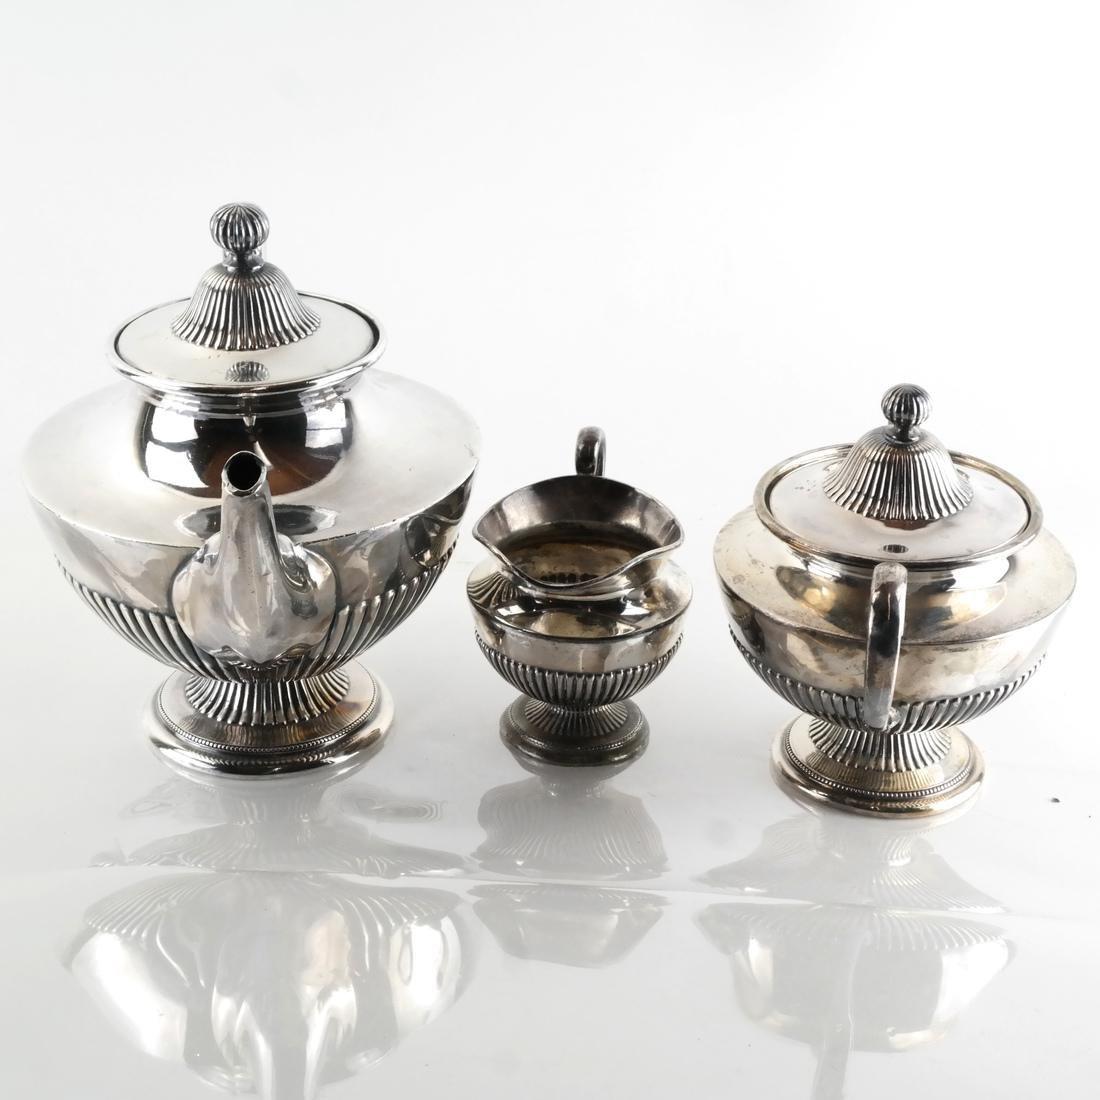 James Dixon & Sons, Silver Plate Tea Service - 7